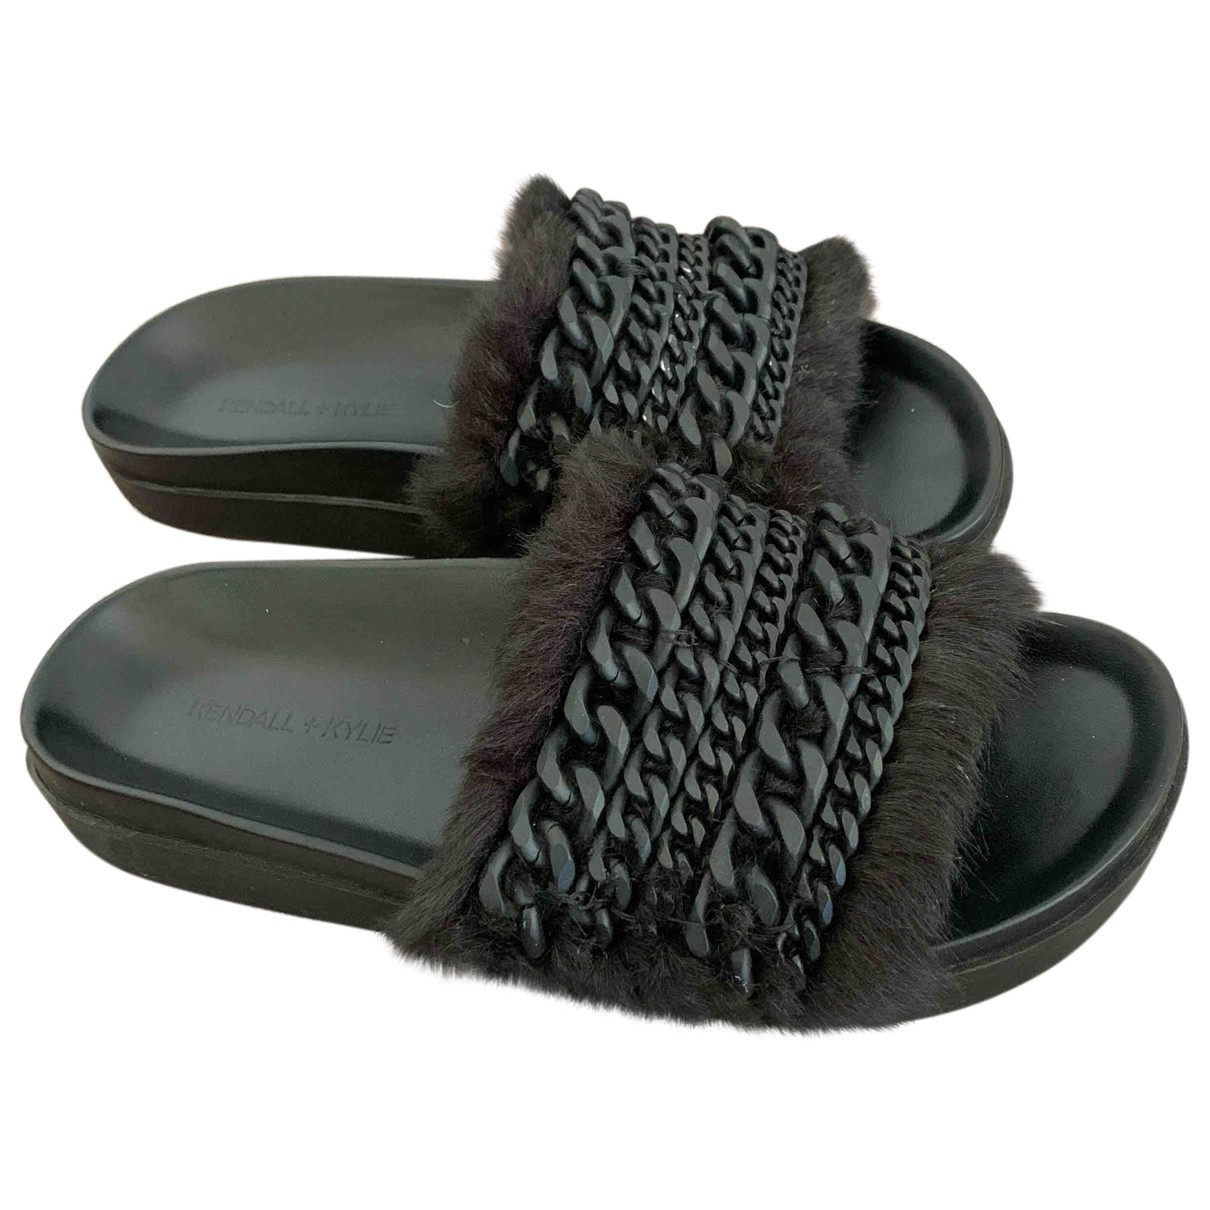 Sandalias de Pelo sintetico Kendall + Kylie